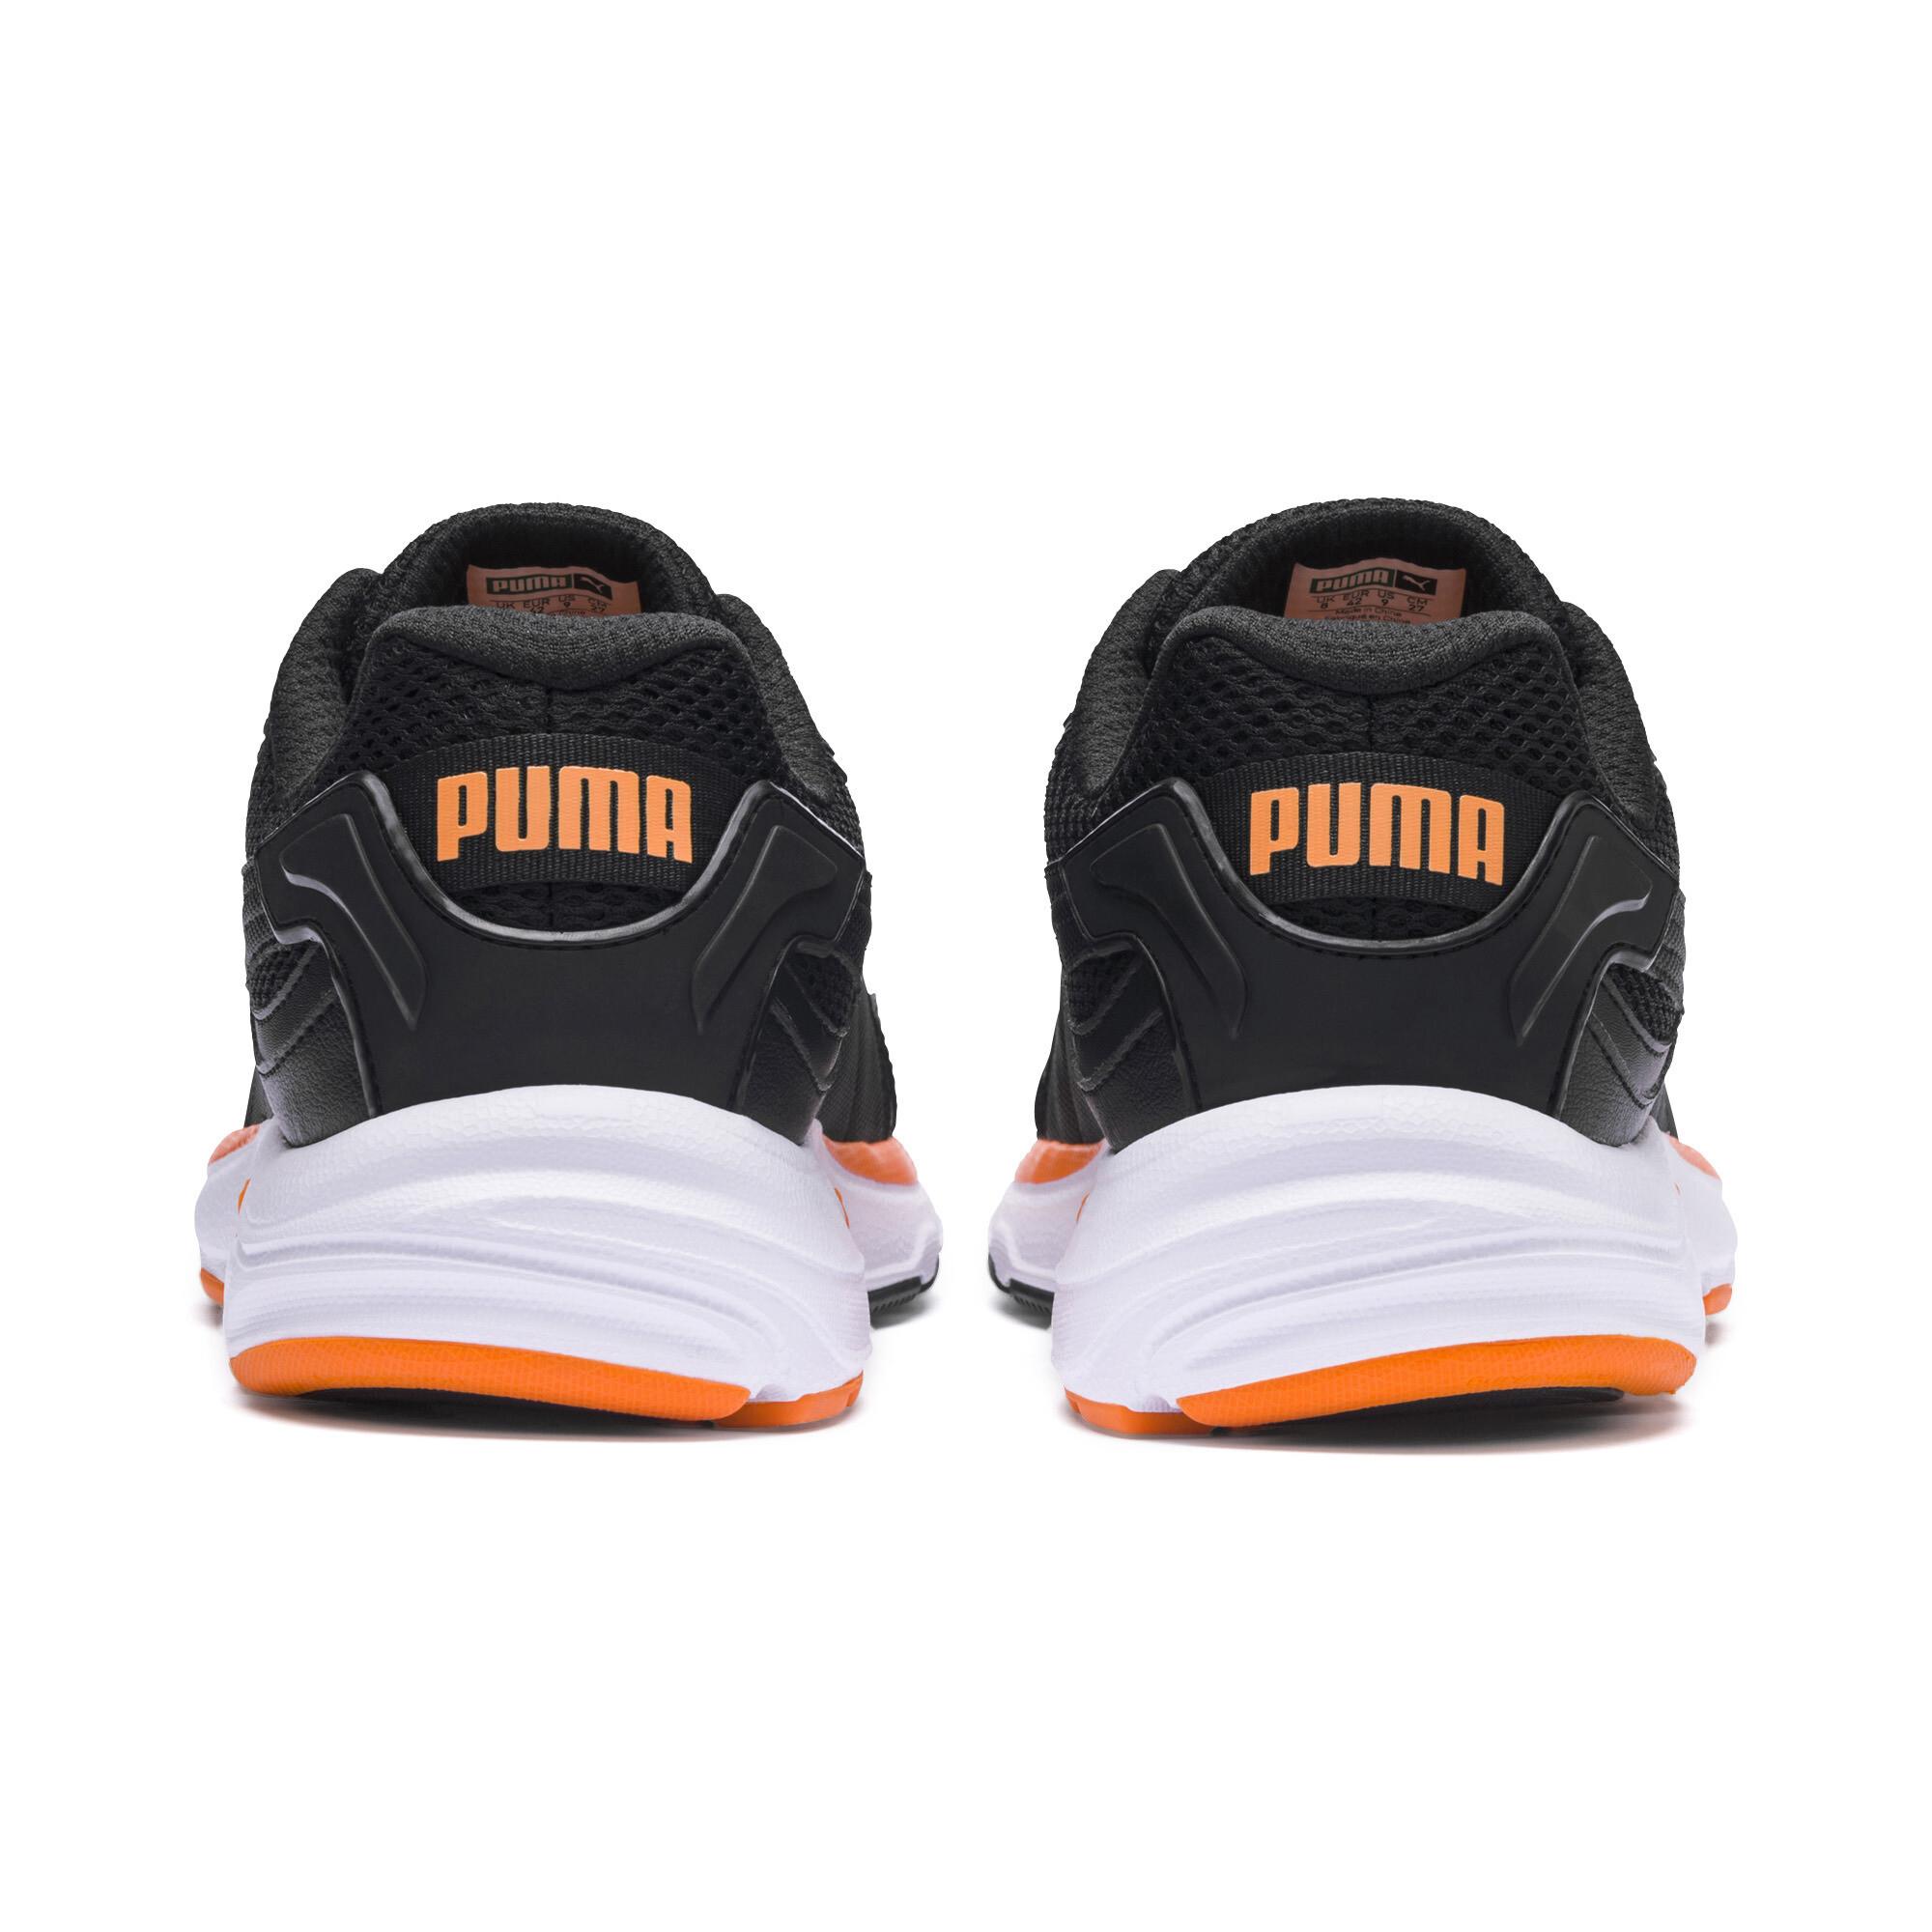 PUMA-Axis-Plus-90s-Sneakers-Men-Shoe-Basics thumbnail 3